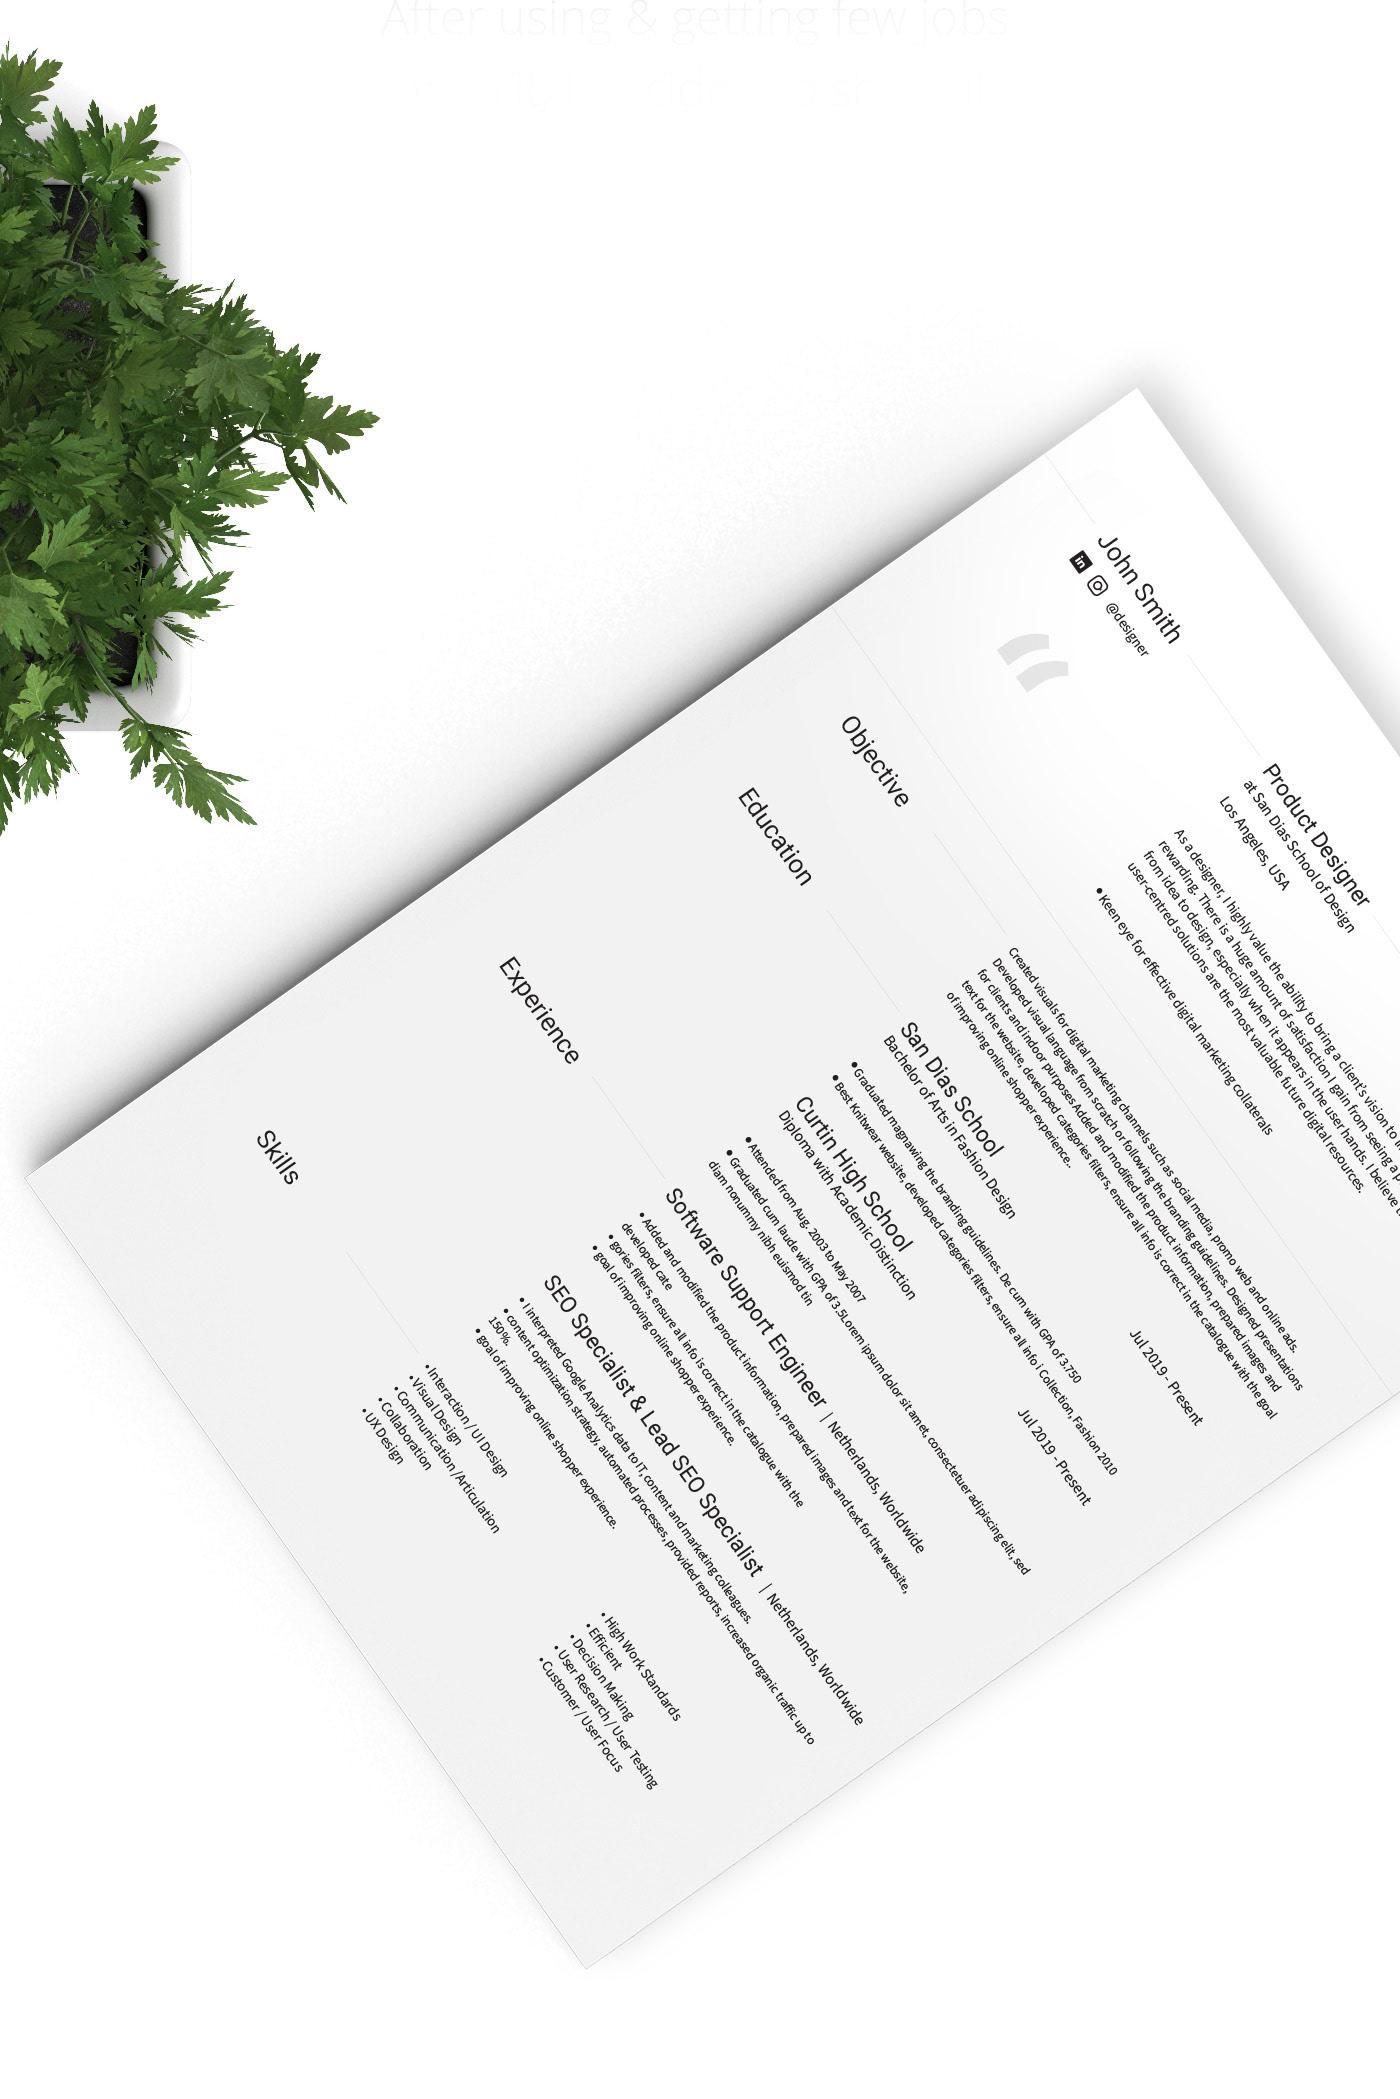 a4 a4 cv business card clean clean resume cover letter creative Creative Resume Curriculum Vitae CV